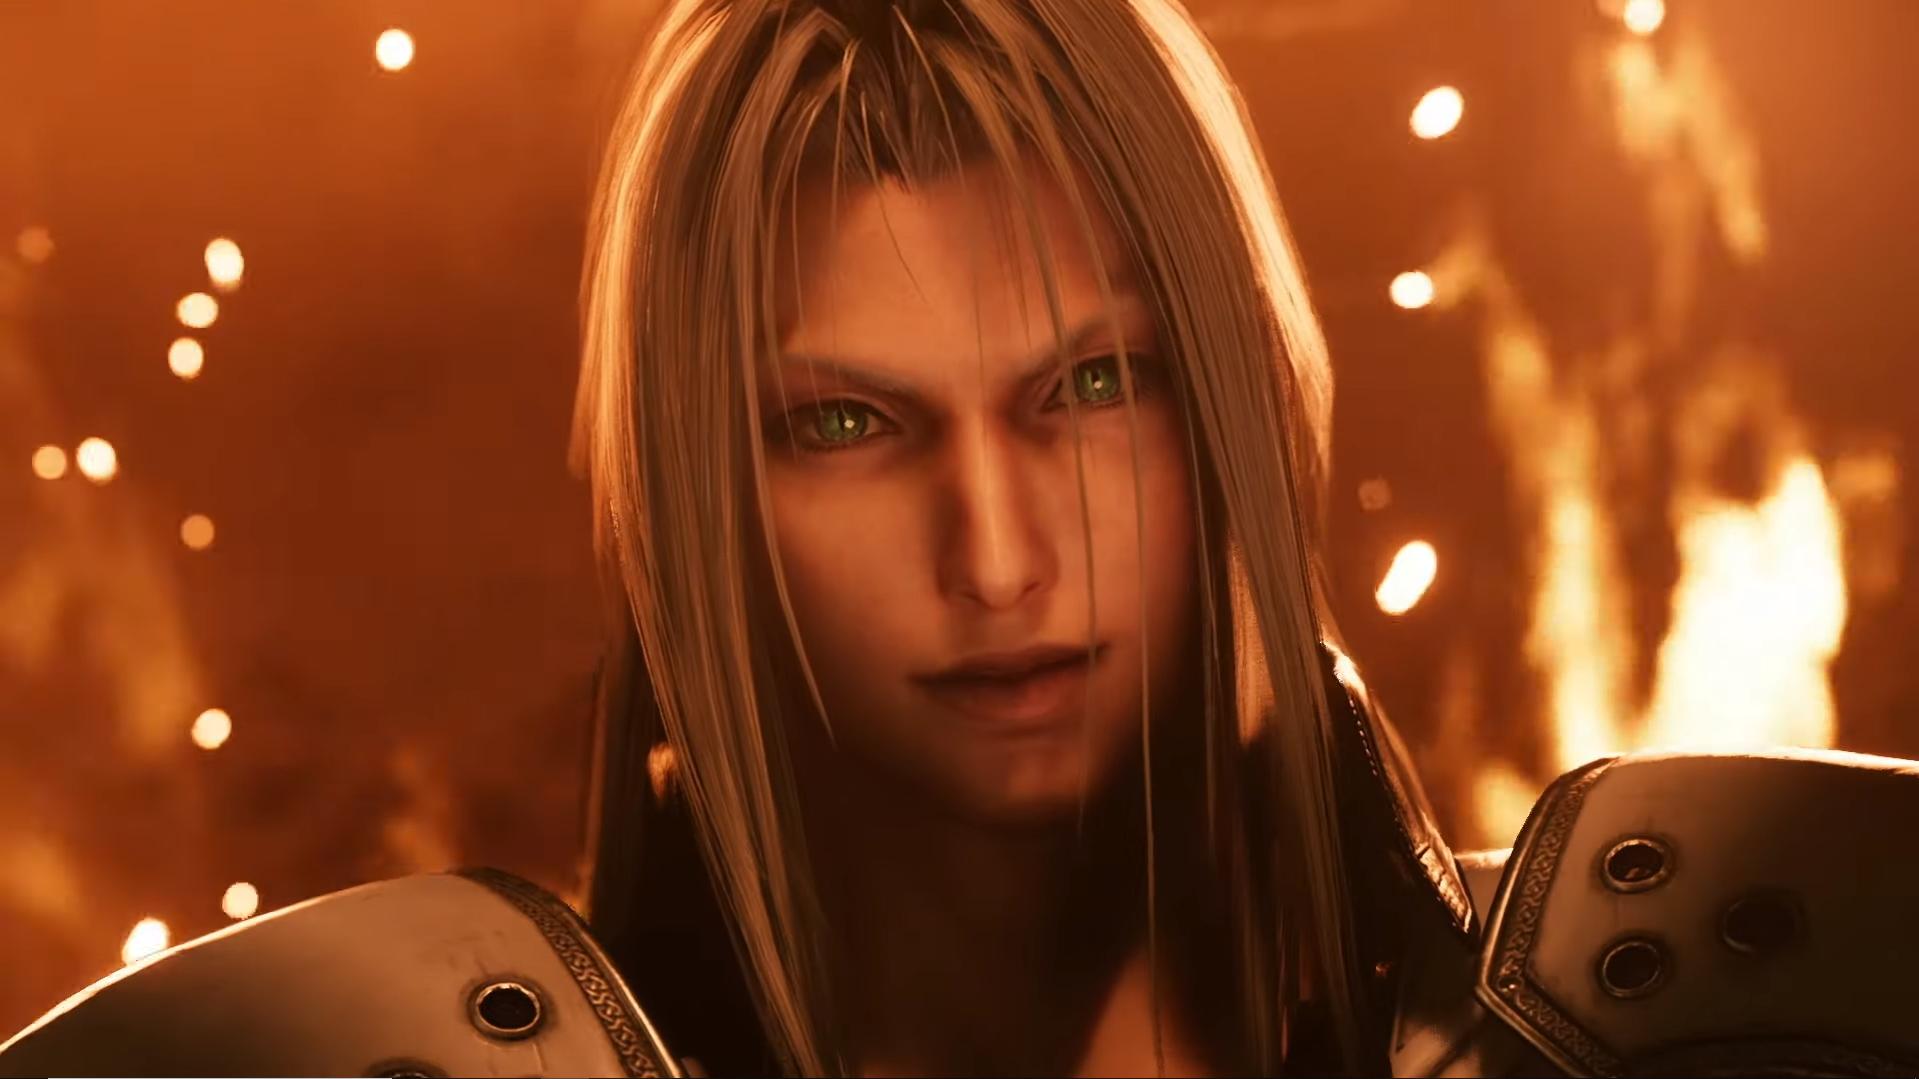 Final Fantasy VII Final Fantasy 7 Remake Remake Square Enix